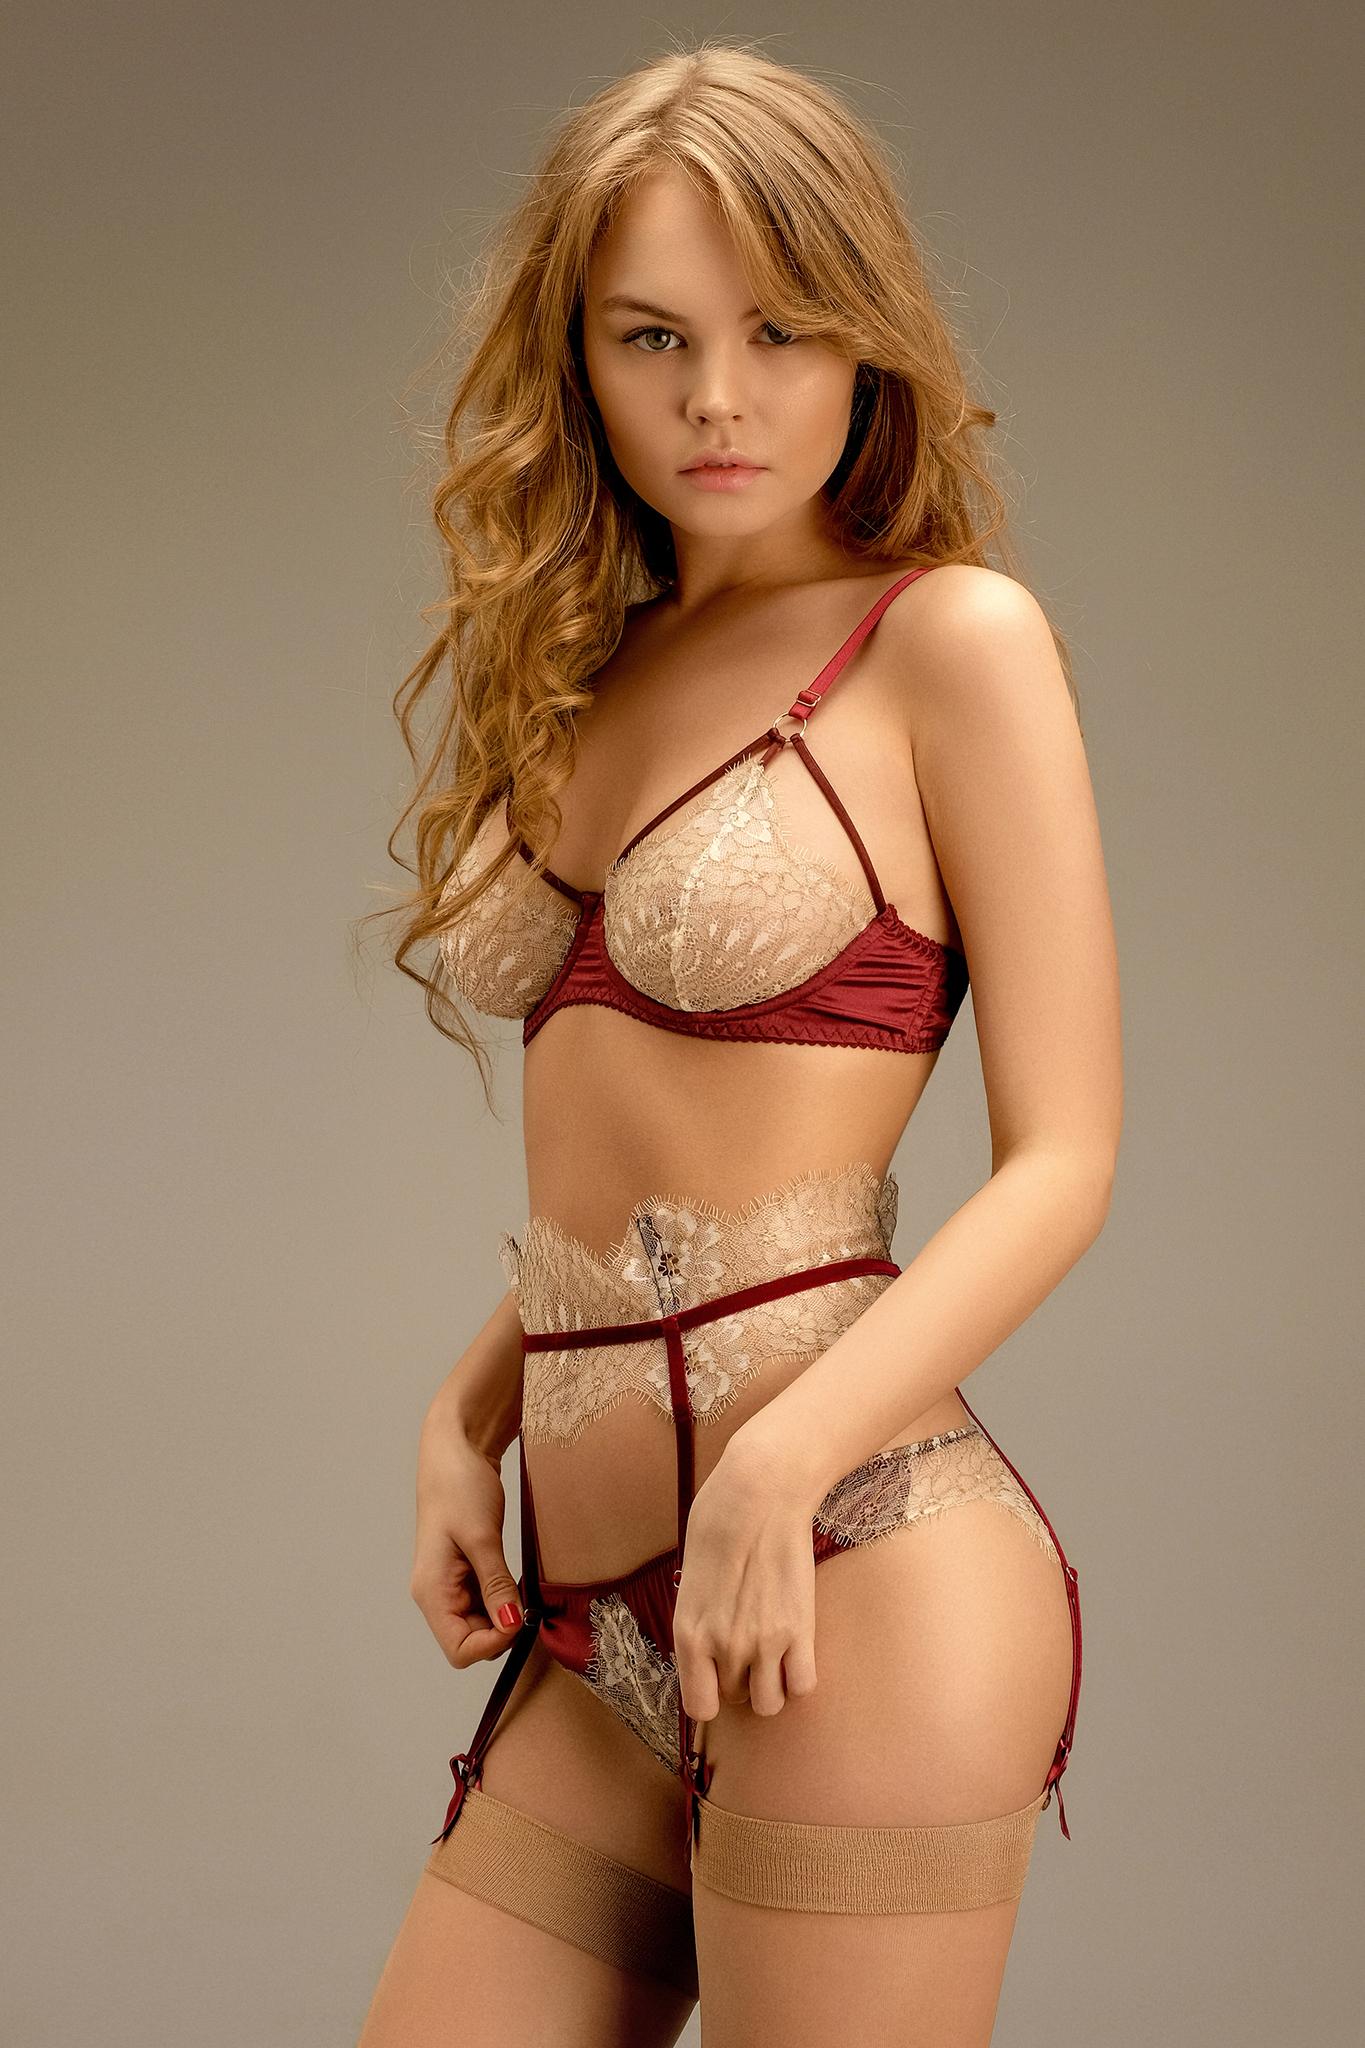 Anastasia Scheglova, model, women, lingerie